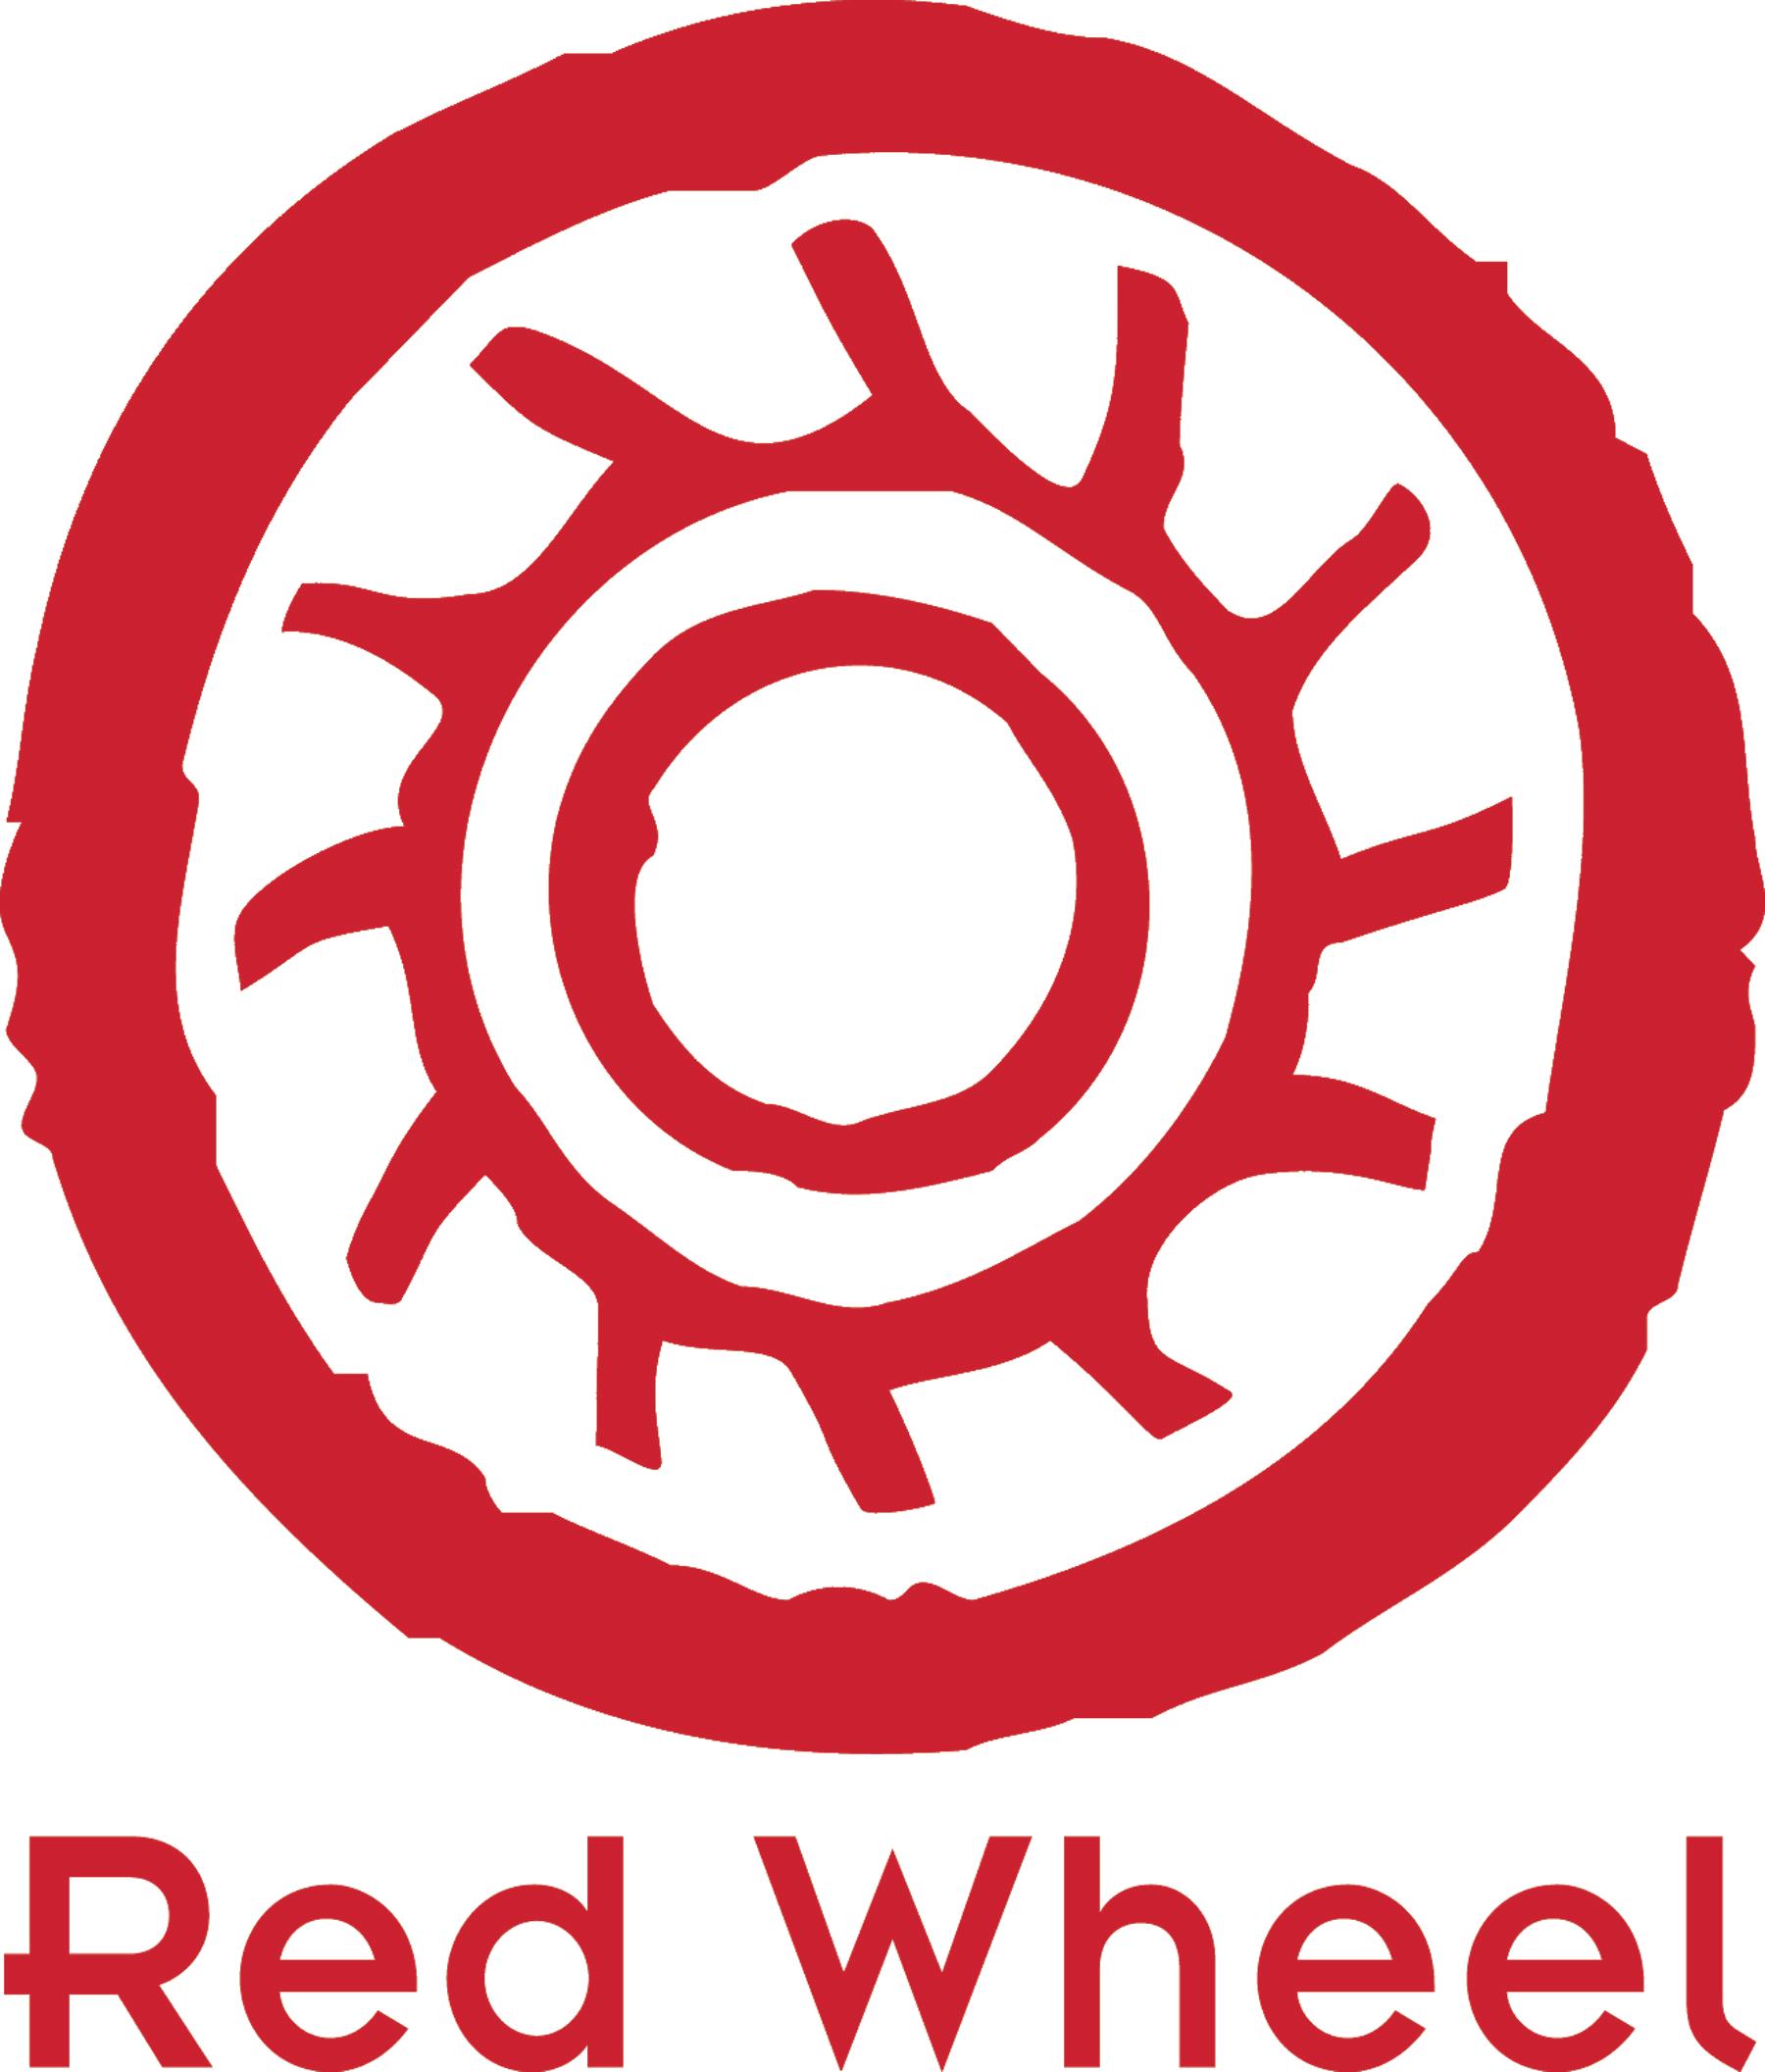 RedWheelWeiserLogo